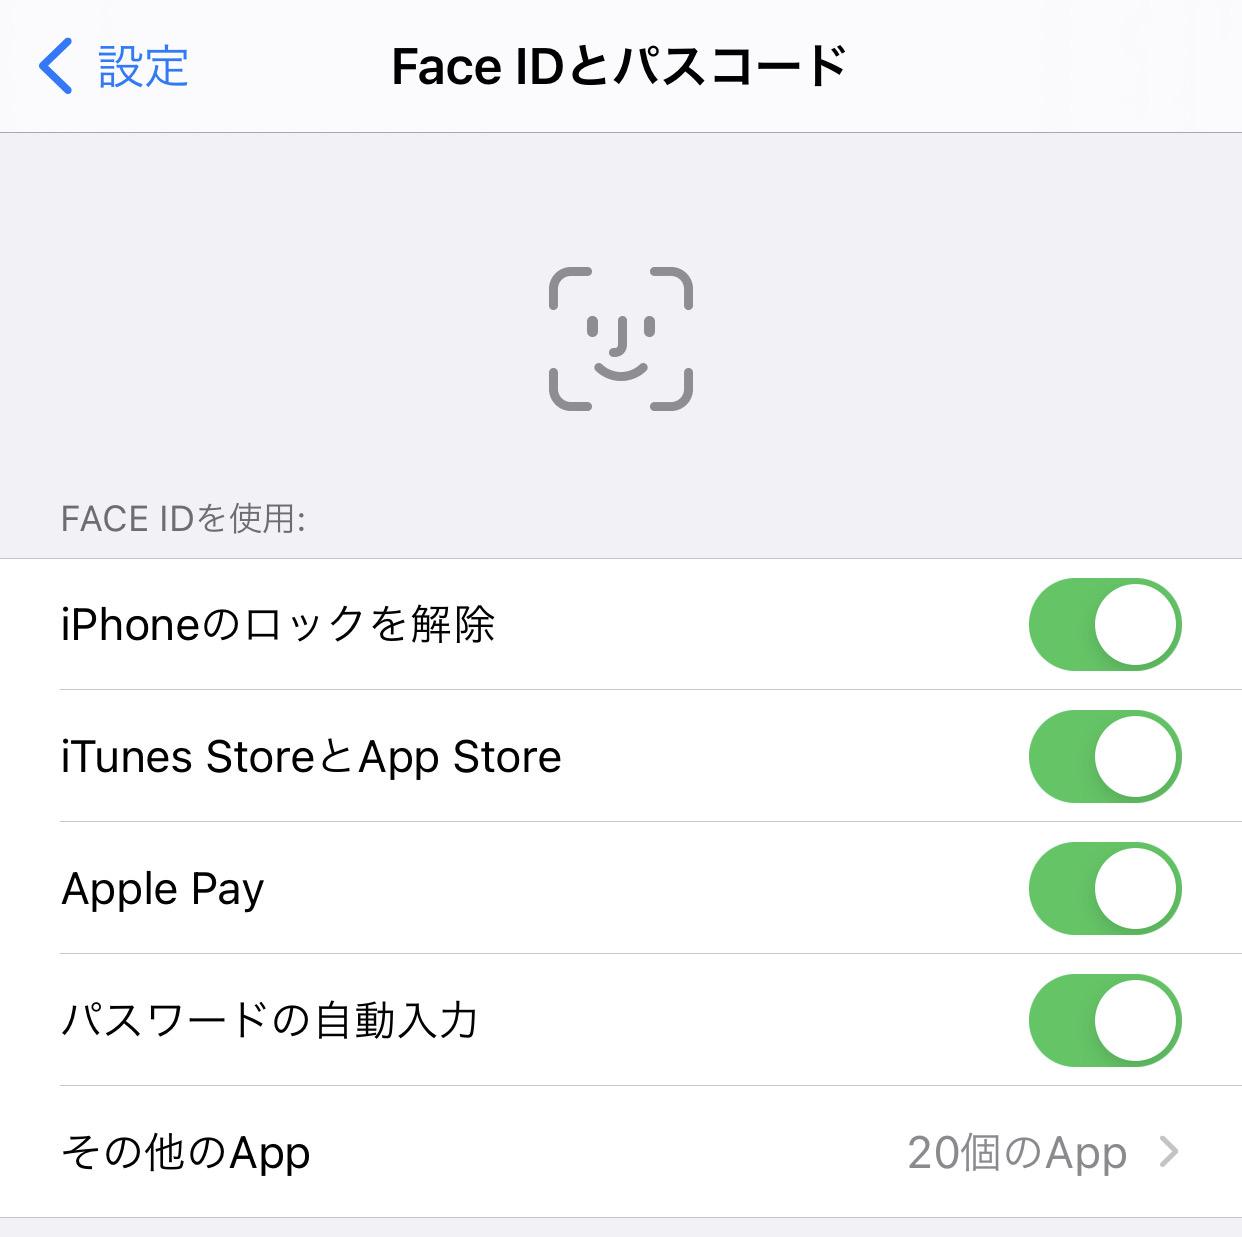 Apple watch face id 01 04